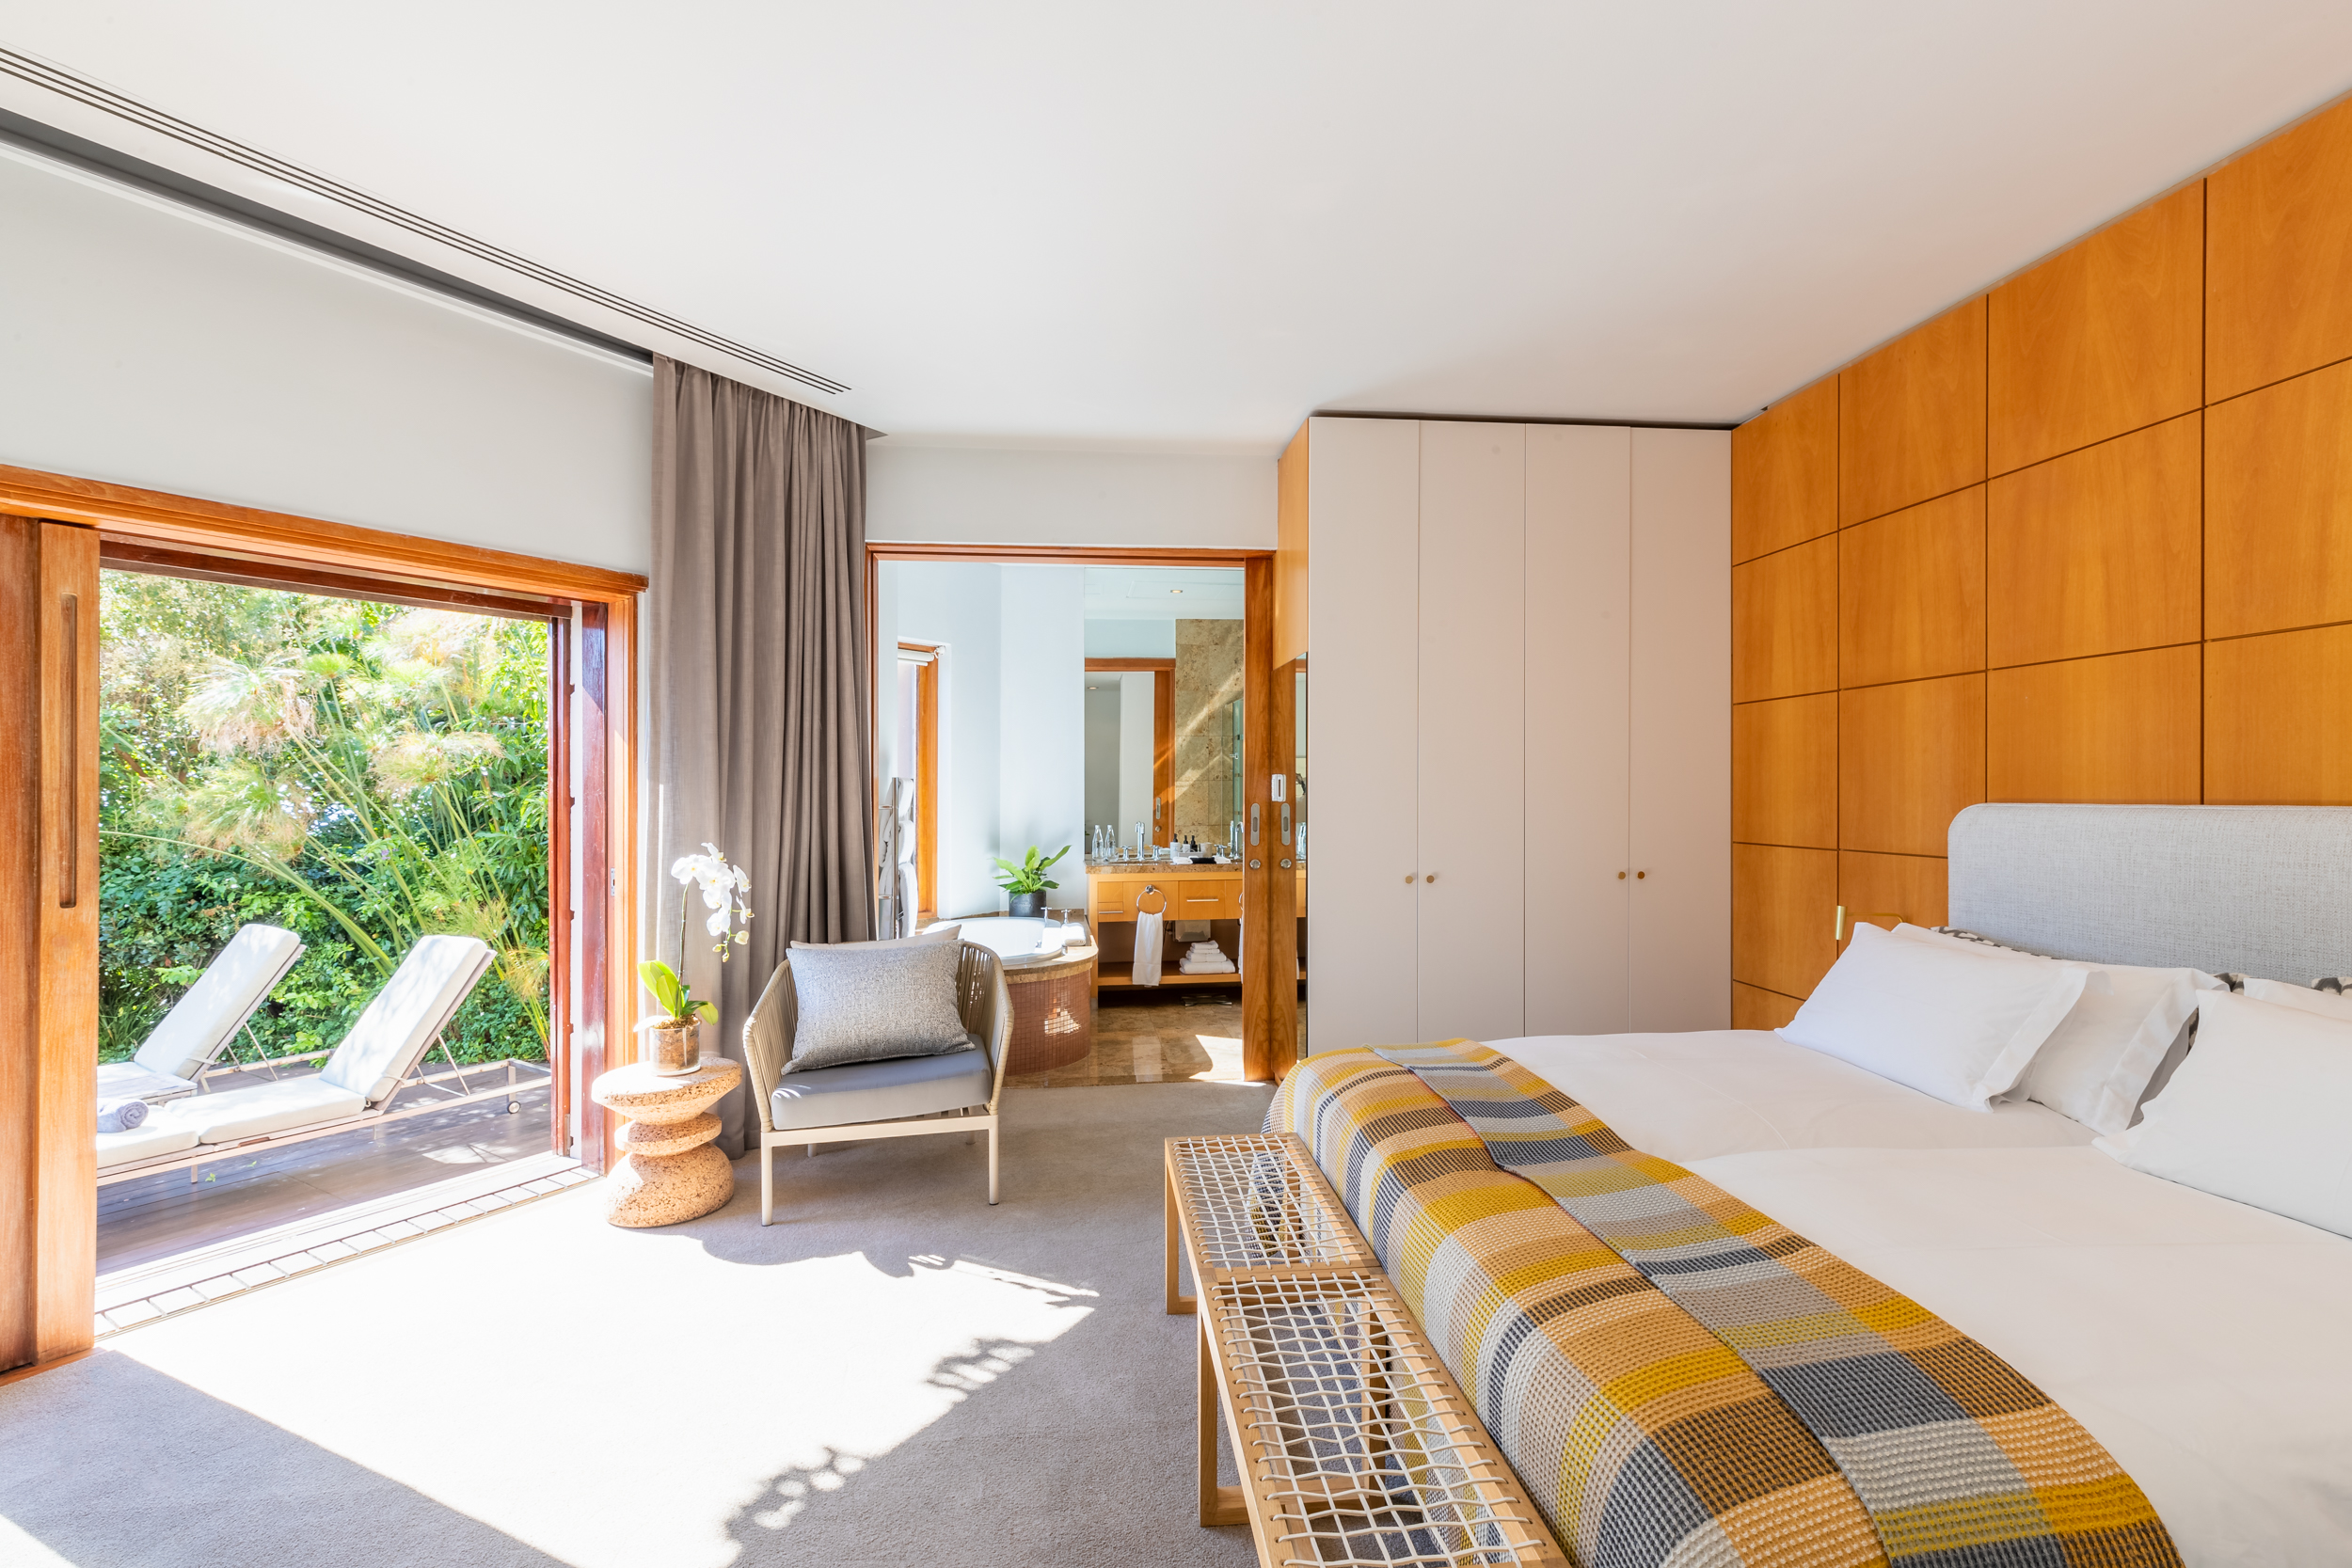 EH - Villa One - Spa Deck Room - 2500px.jpg